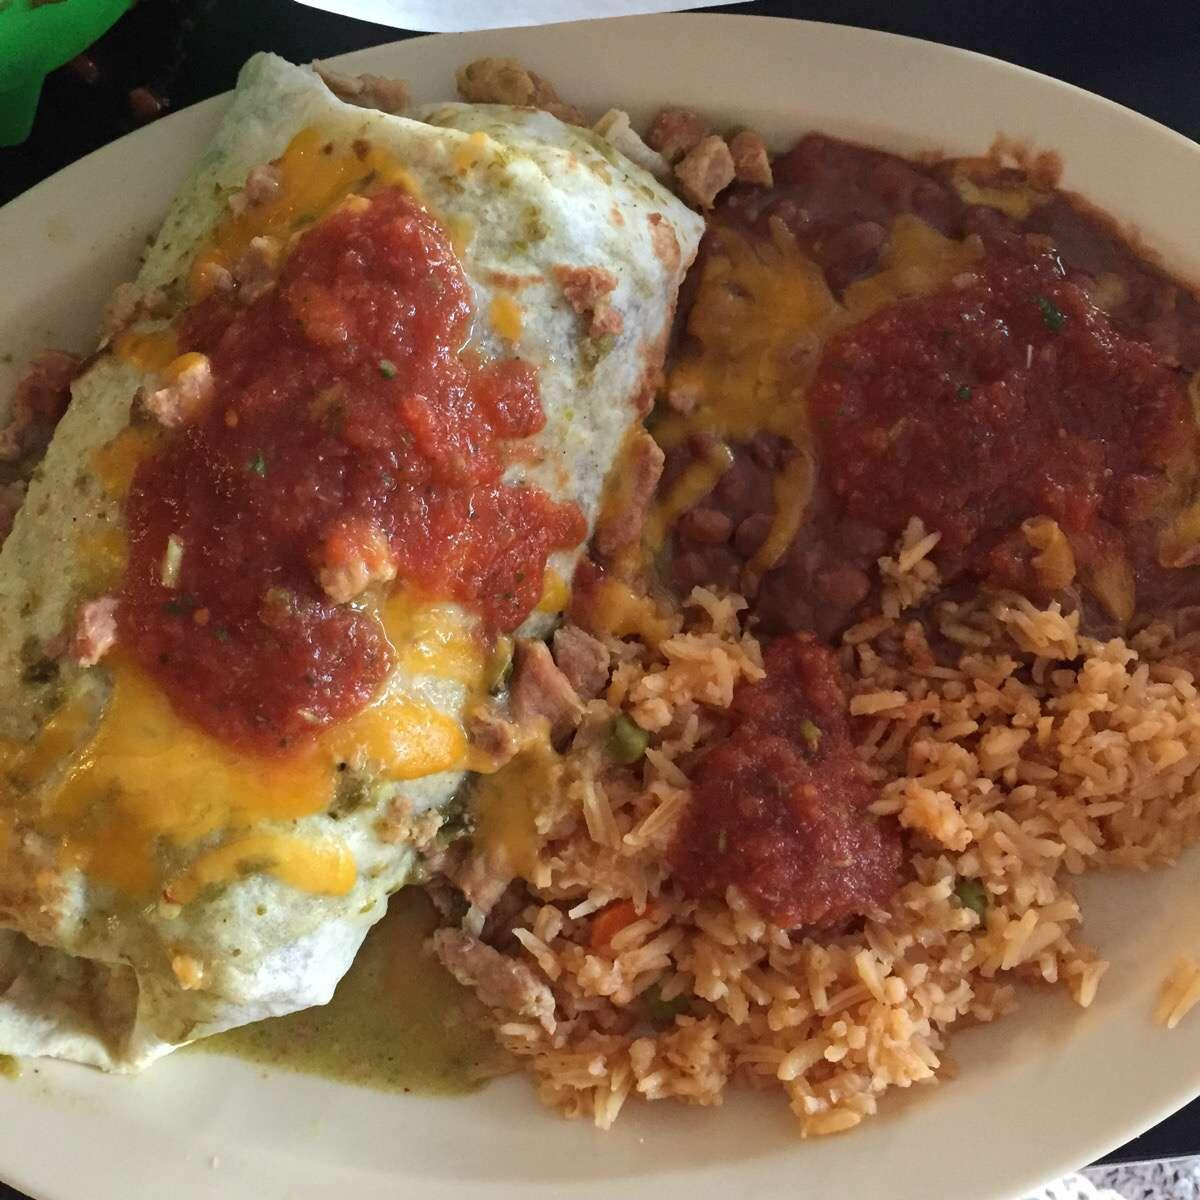 Paleteria La Reyna In Wichita Restaurant Menu And Reviews